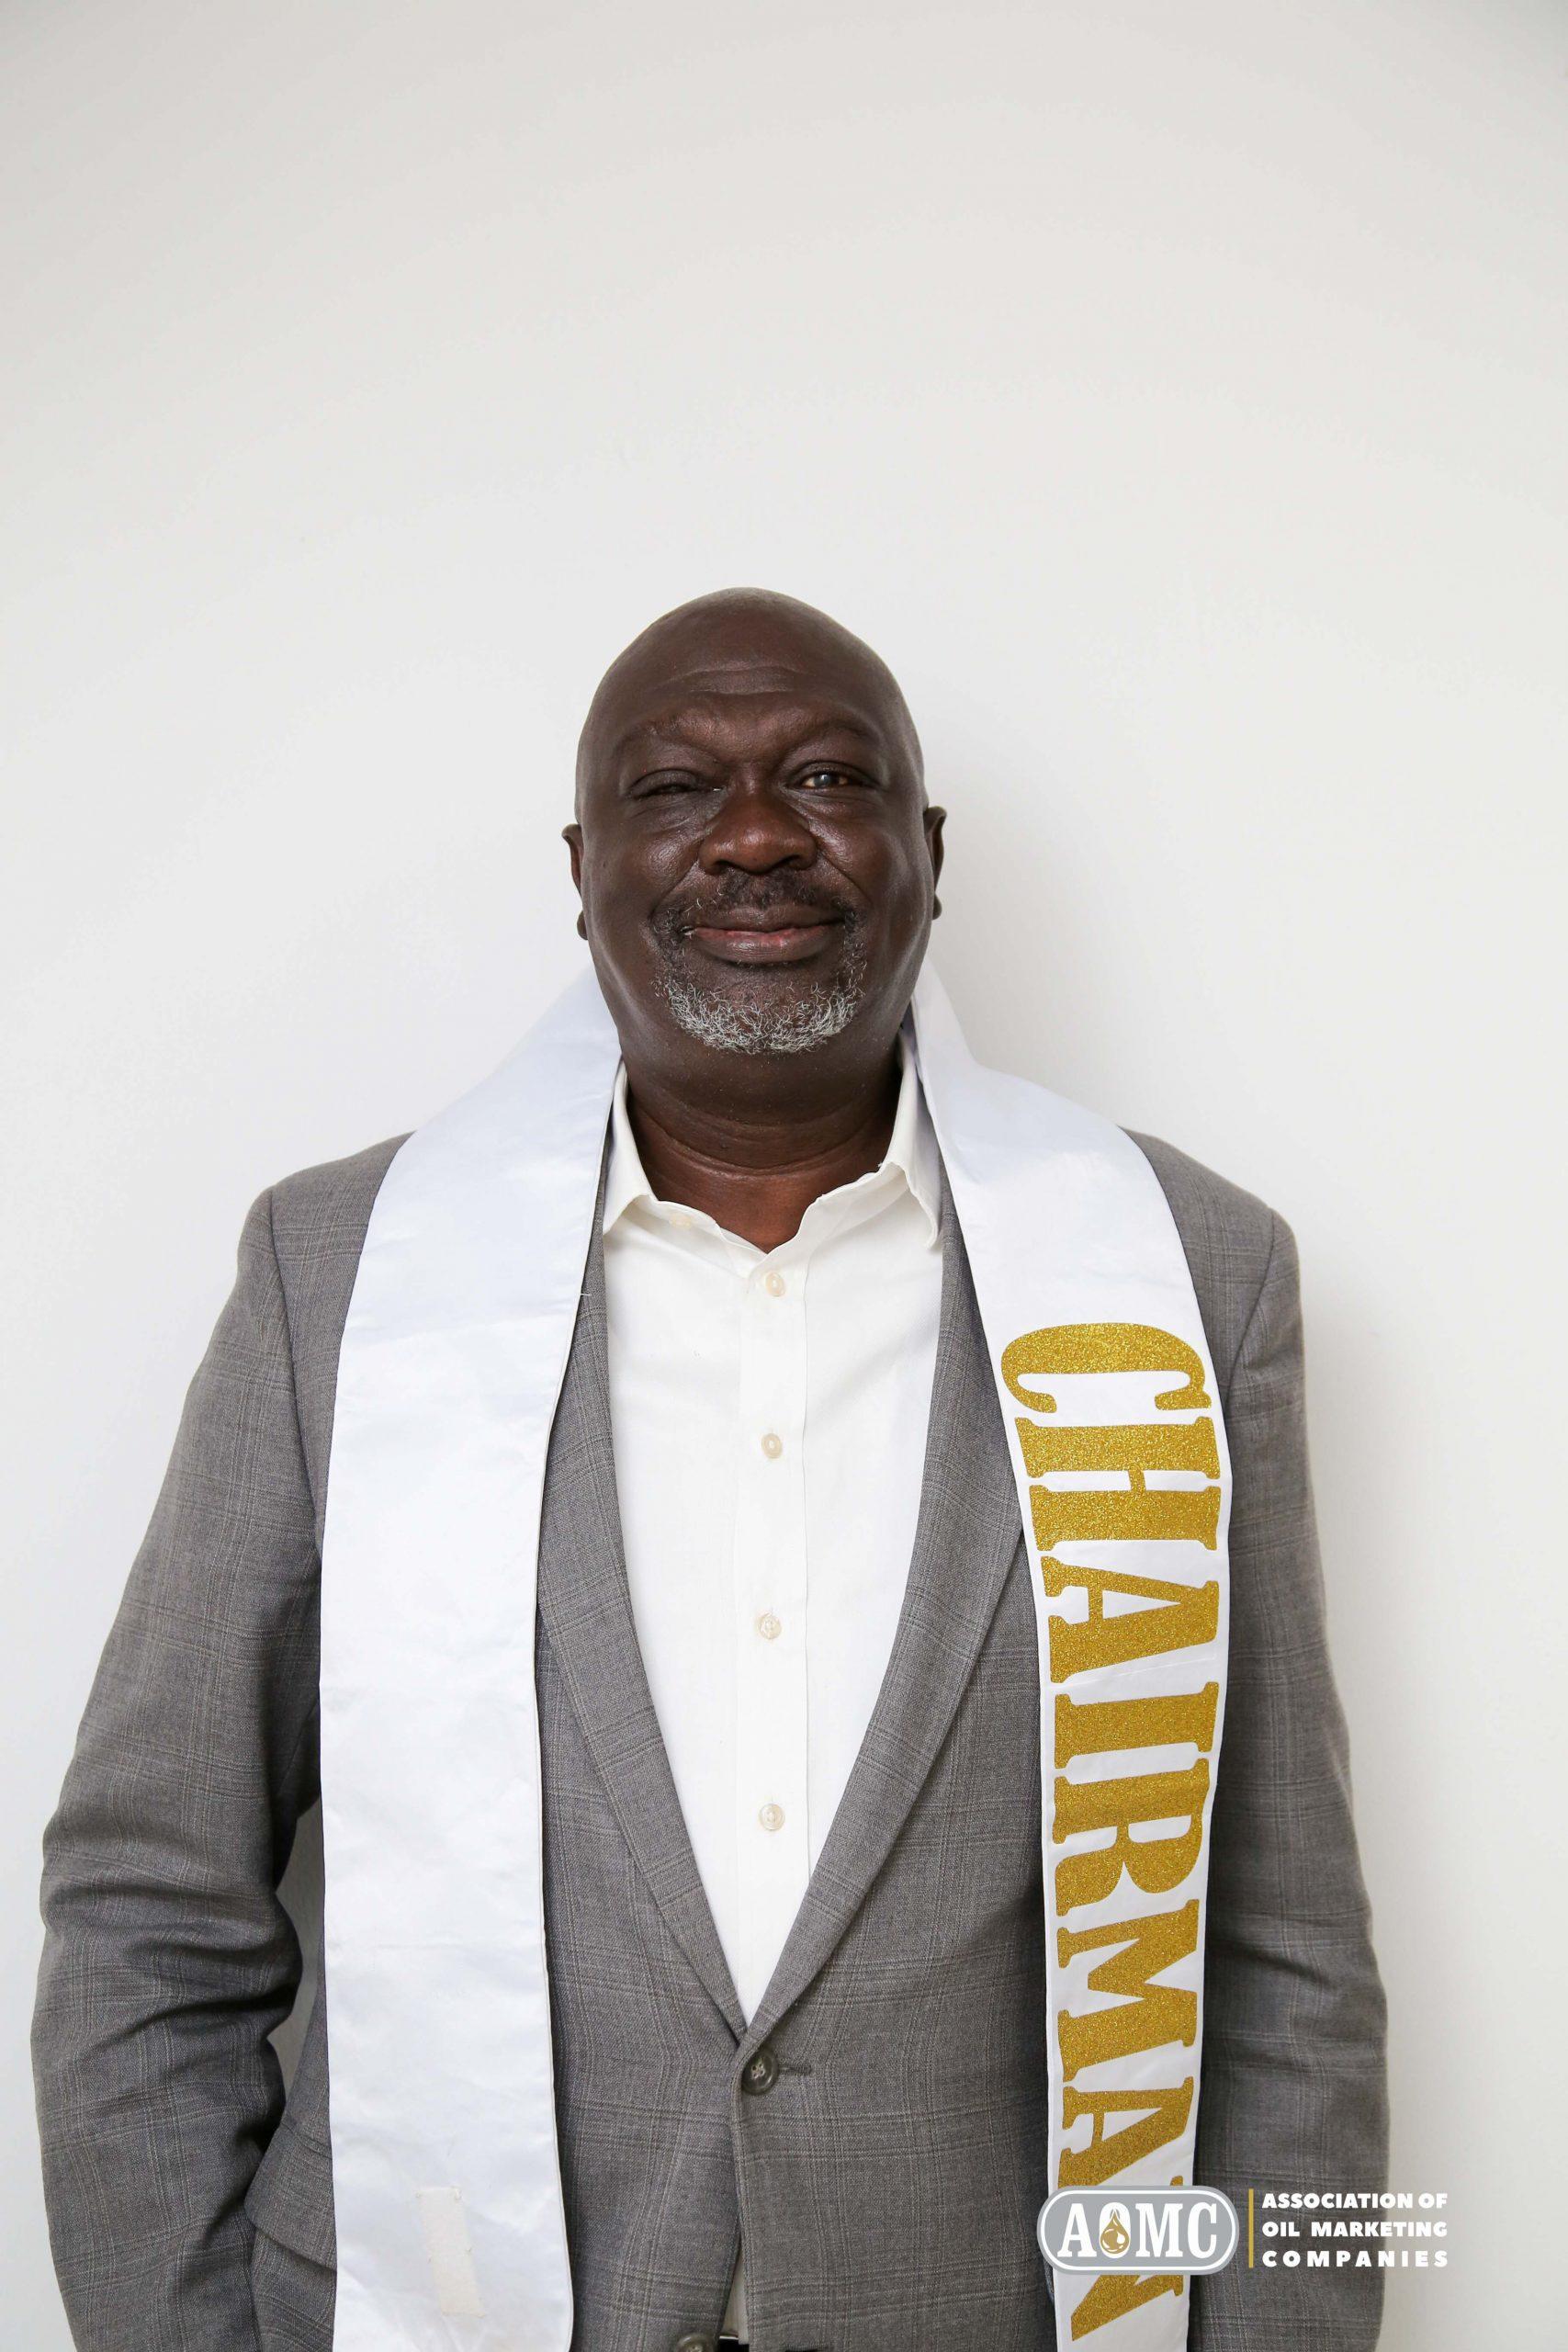 Felix Gyekye, MD Of Glory Oil Is The New Board Chairman Of The Association Of Oil Marketing Companies (AOMC)